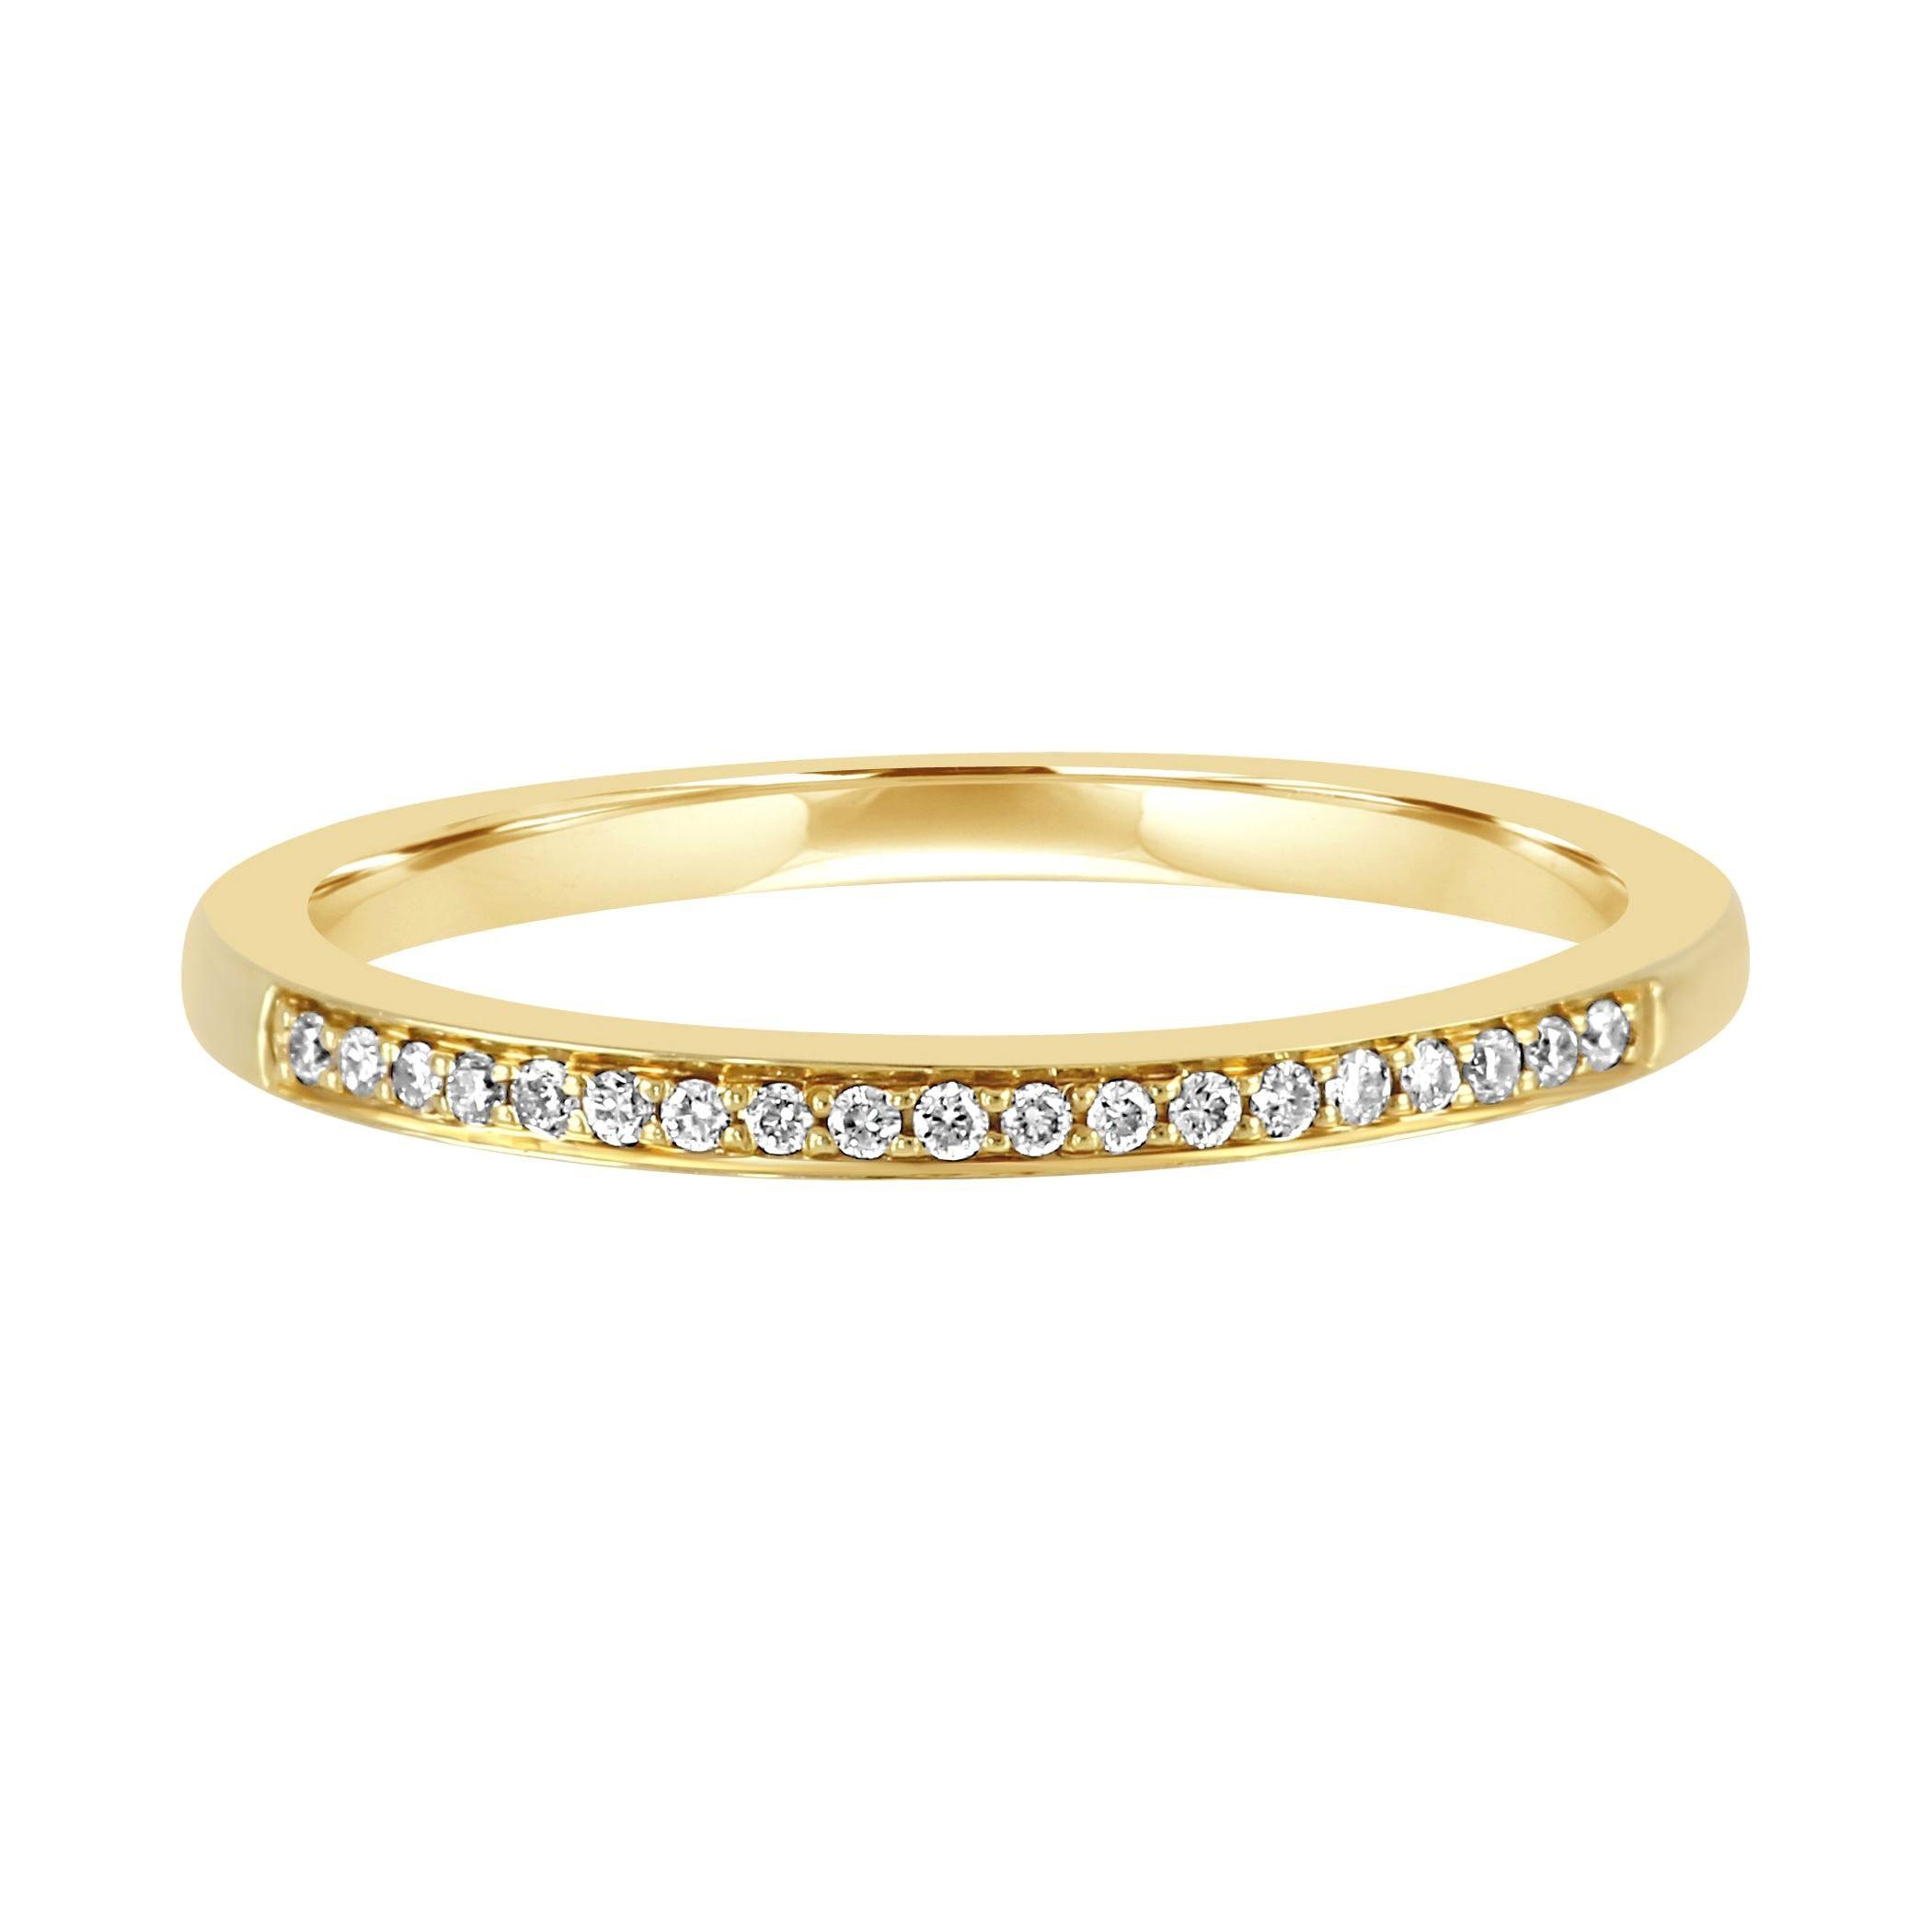 White Diamond Round 14k Yellow Gold Bridal Fashion Stackable Band Ring